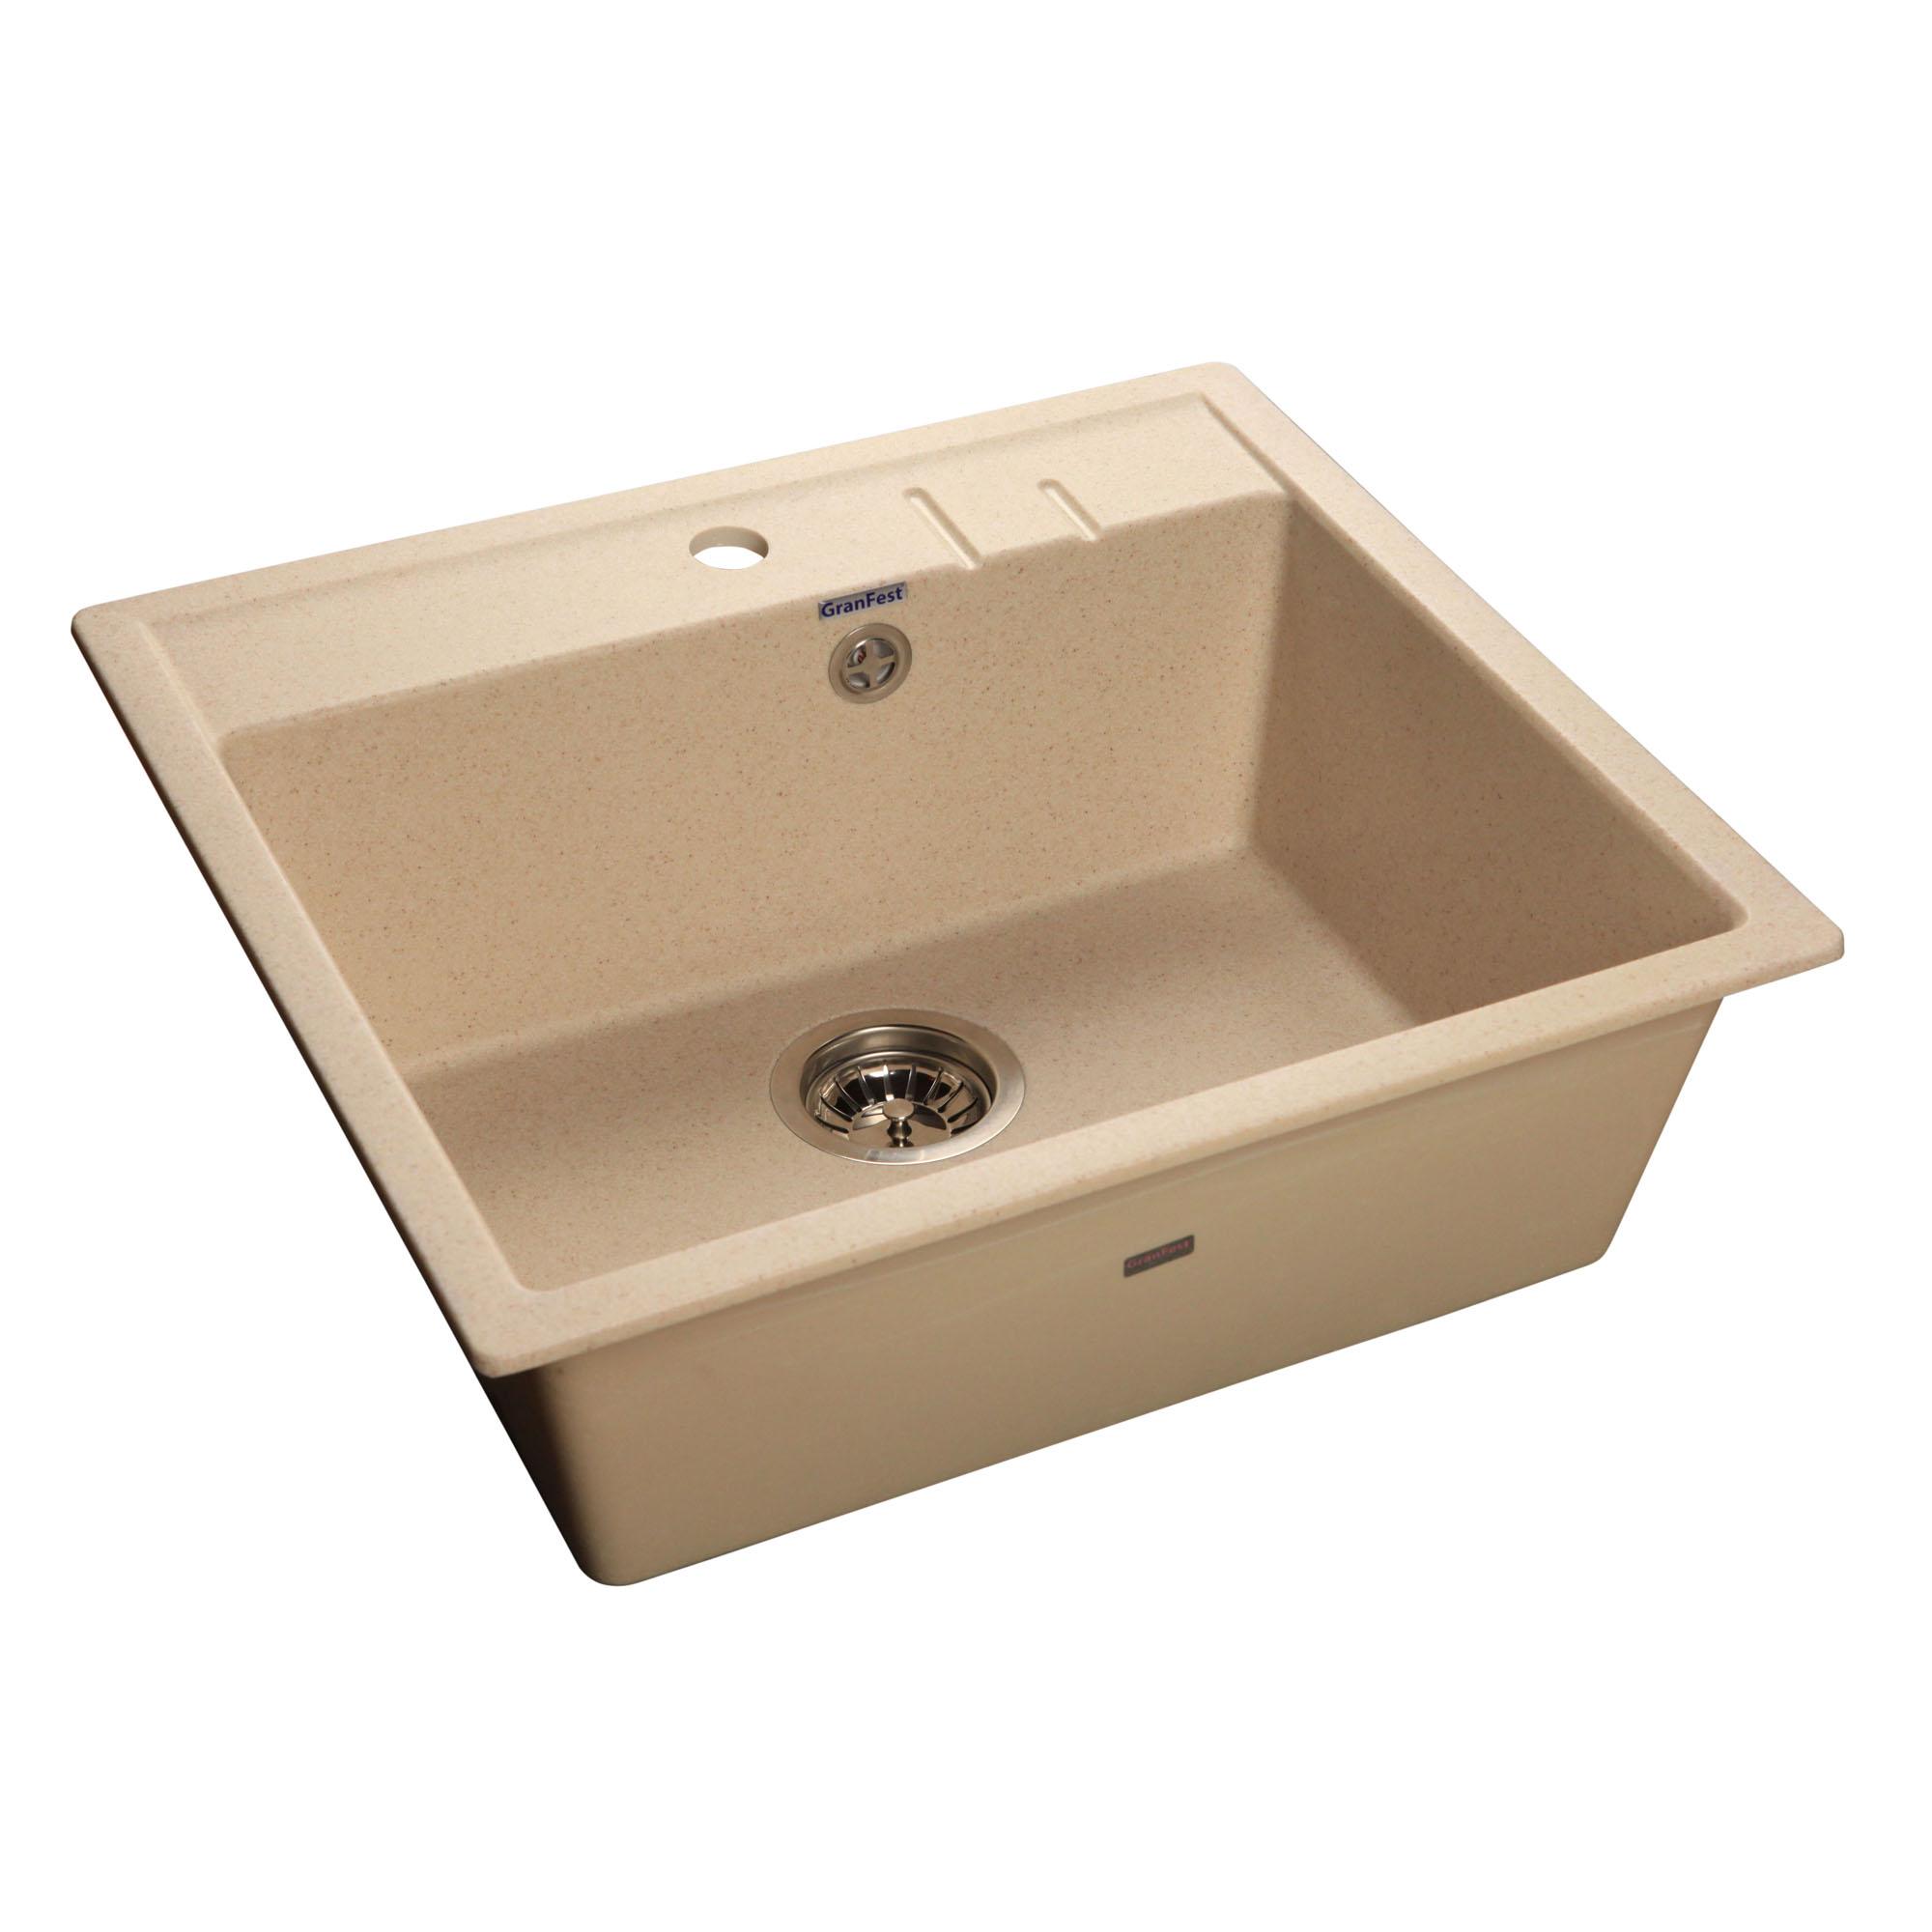 Кухонная мойка GranFest Quadro GF-Q560 бежевый мойка кухонная granfest гранит 565x510 gf q560 песок